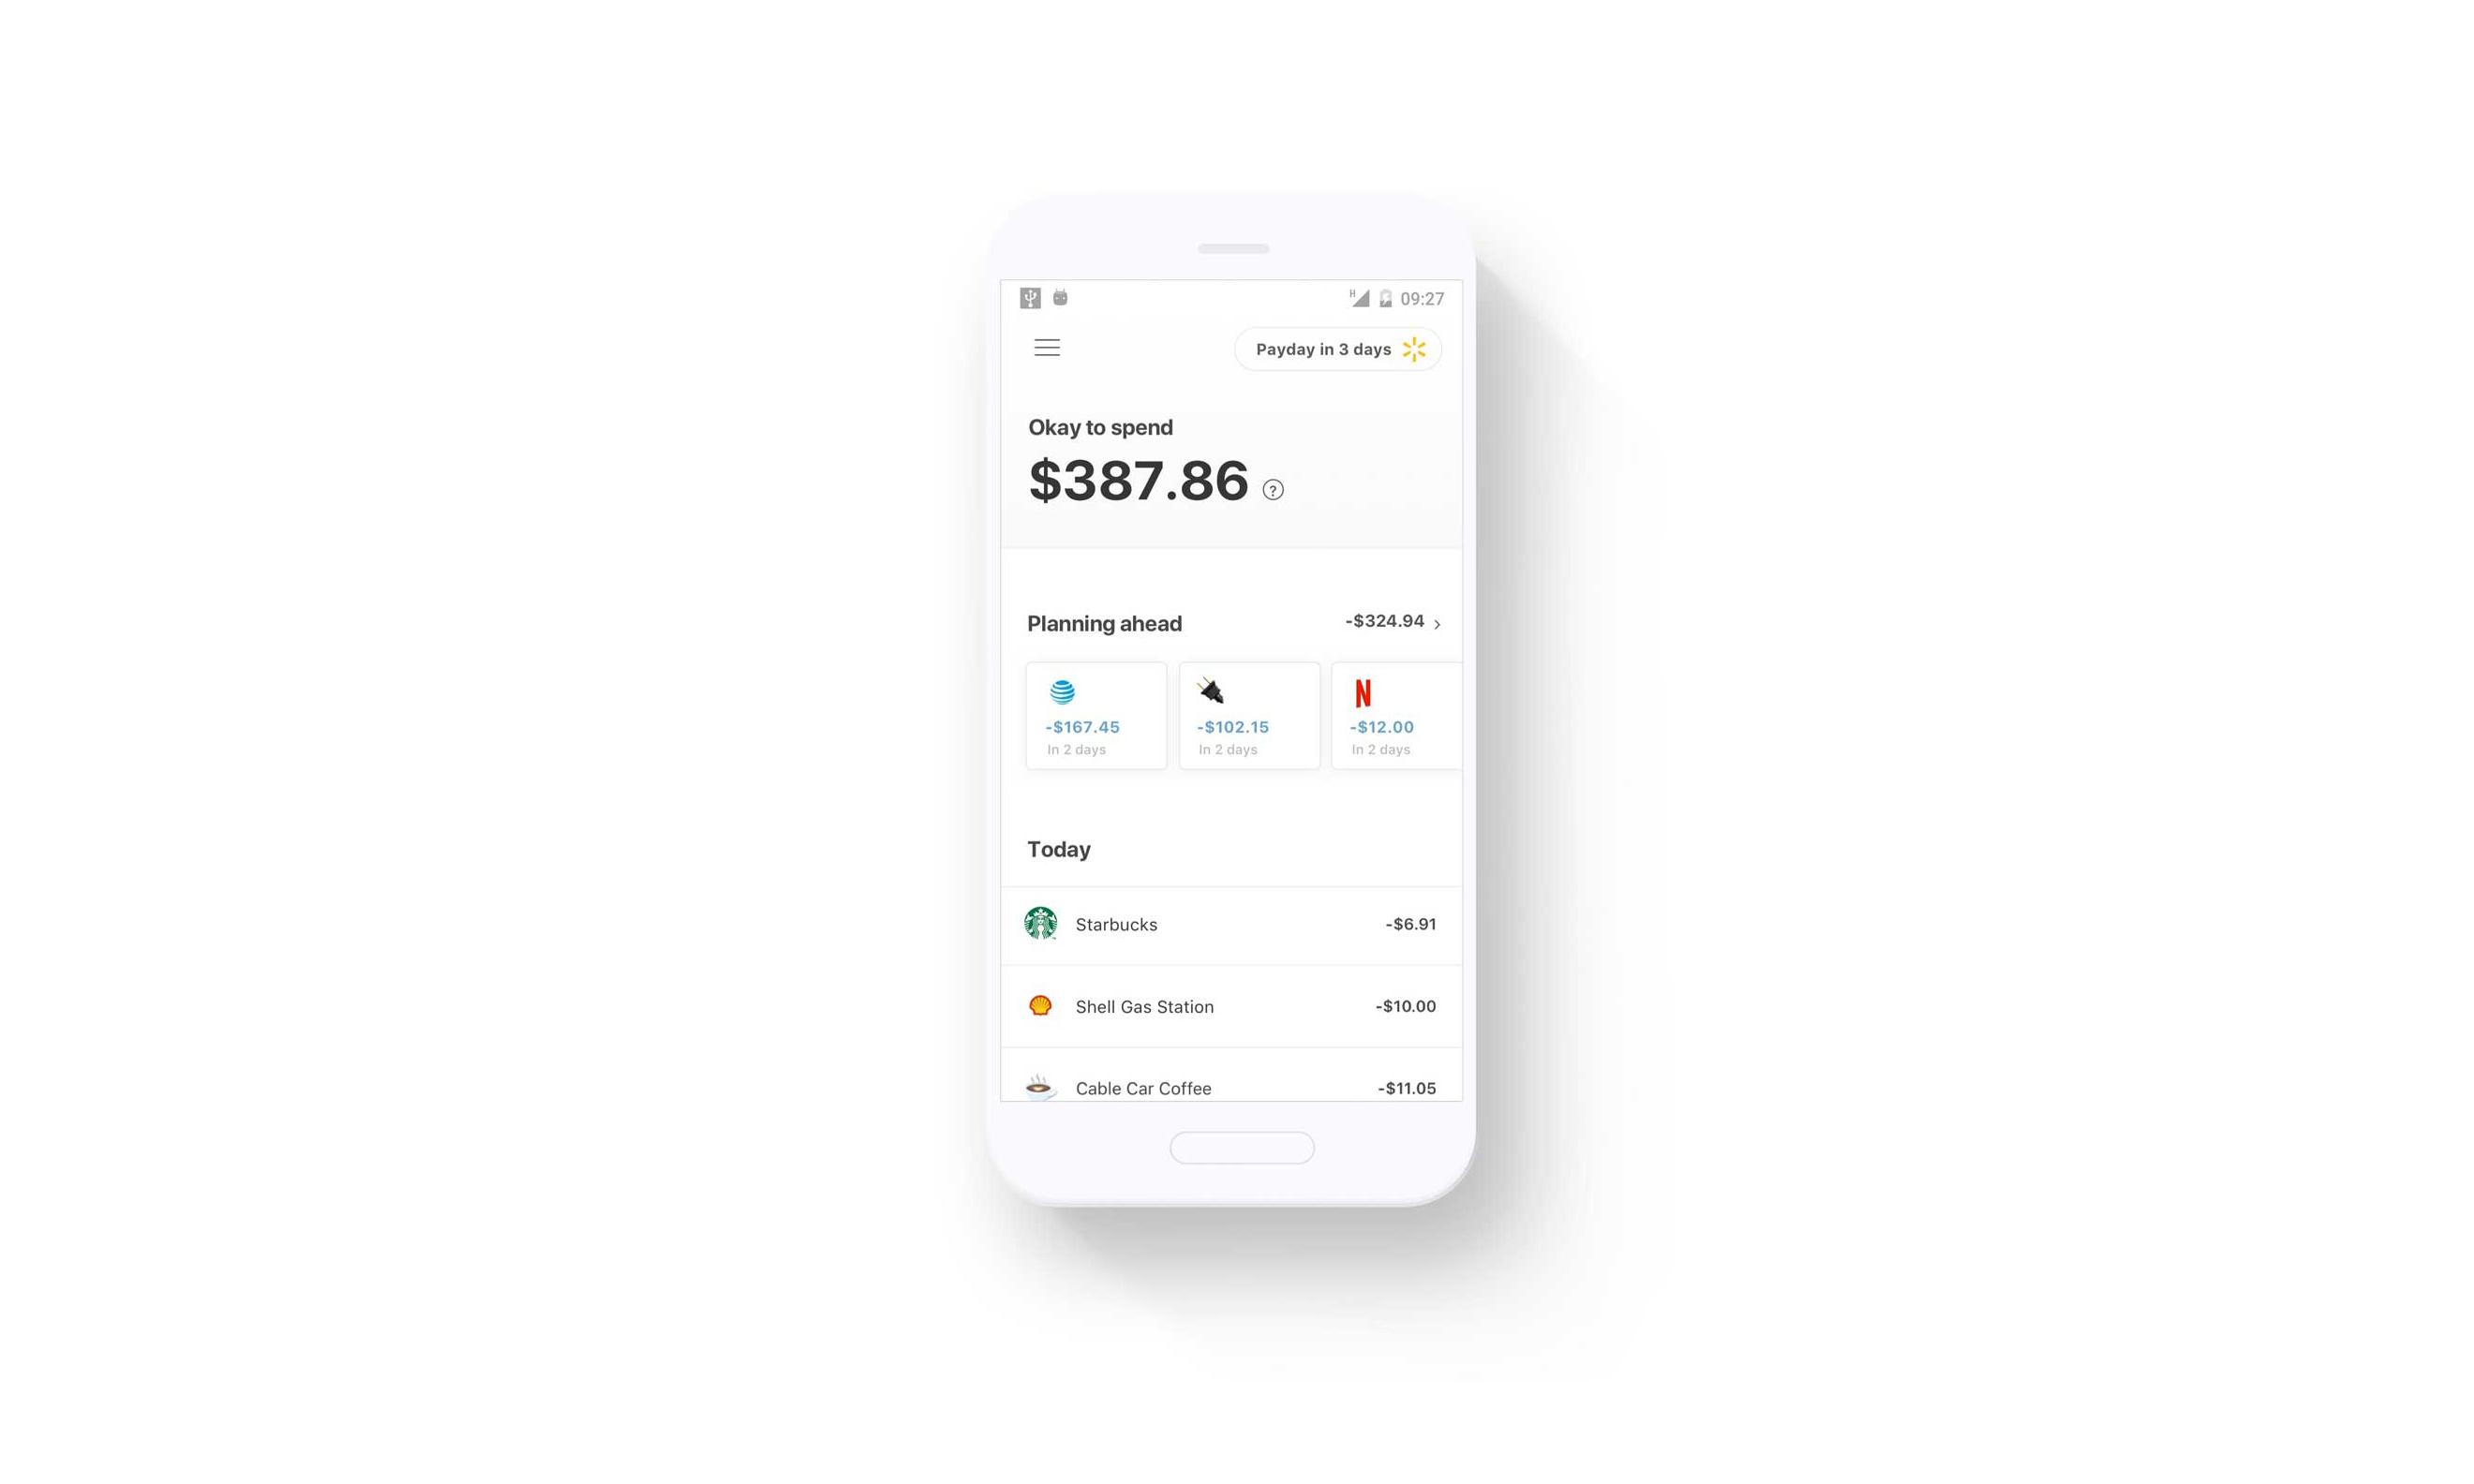 Walmart's financial services app